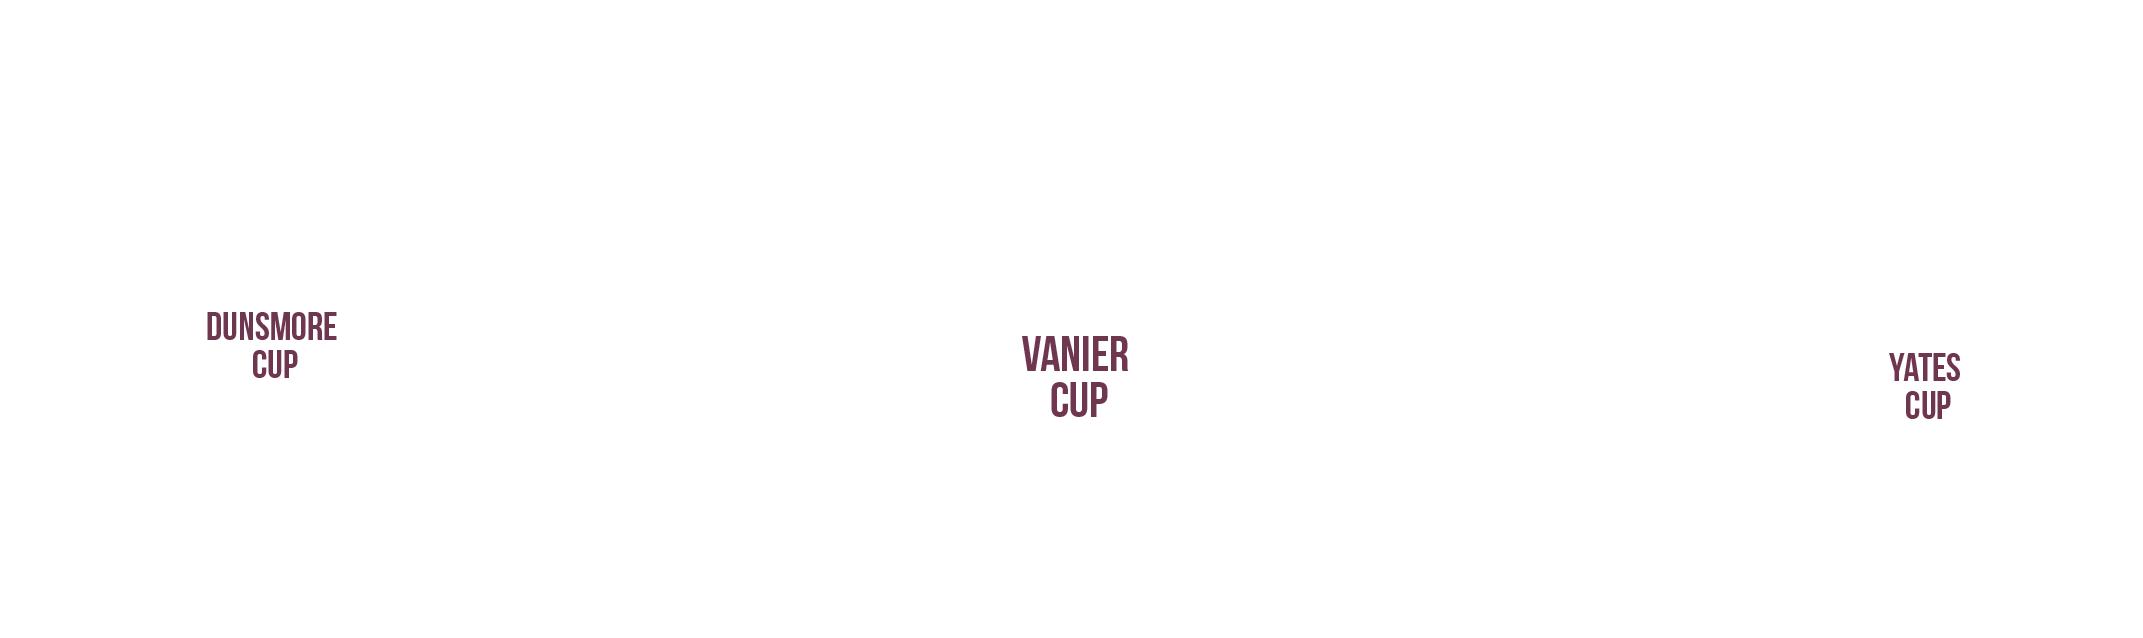 FootballGraphics-3-03.png